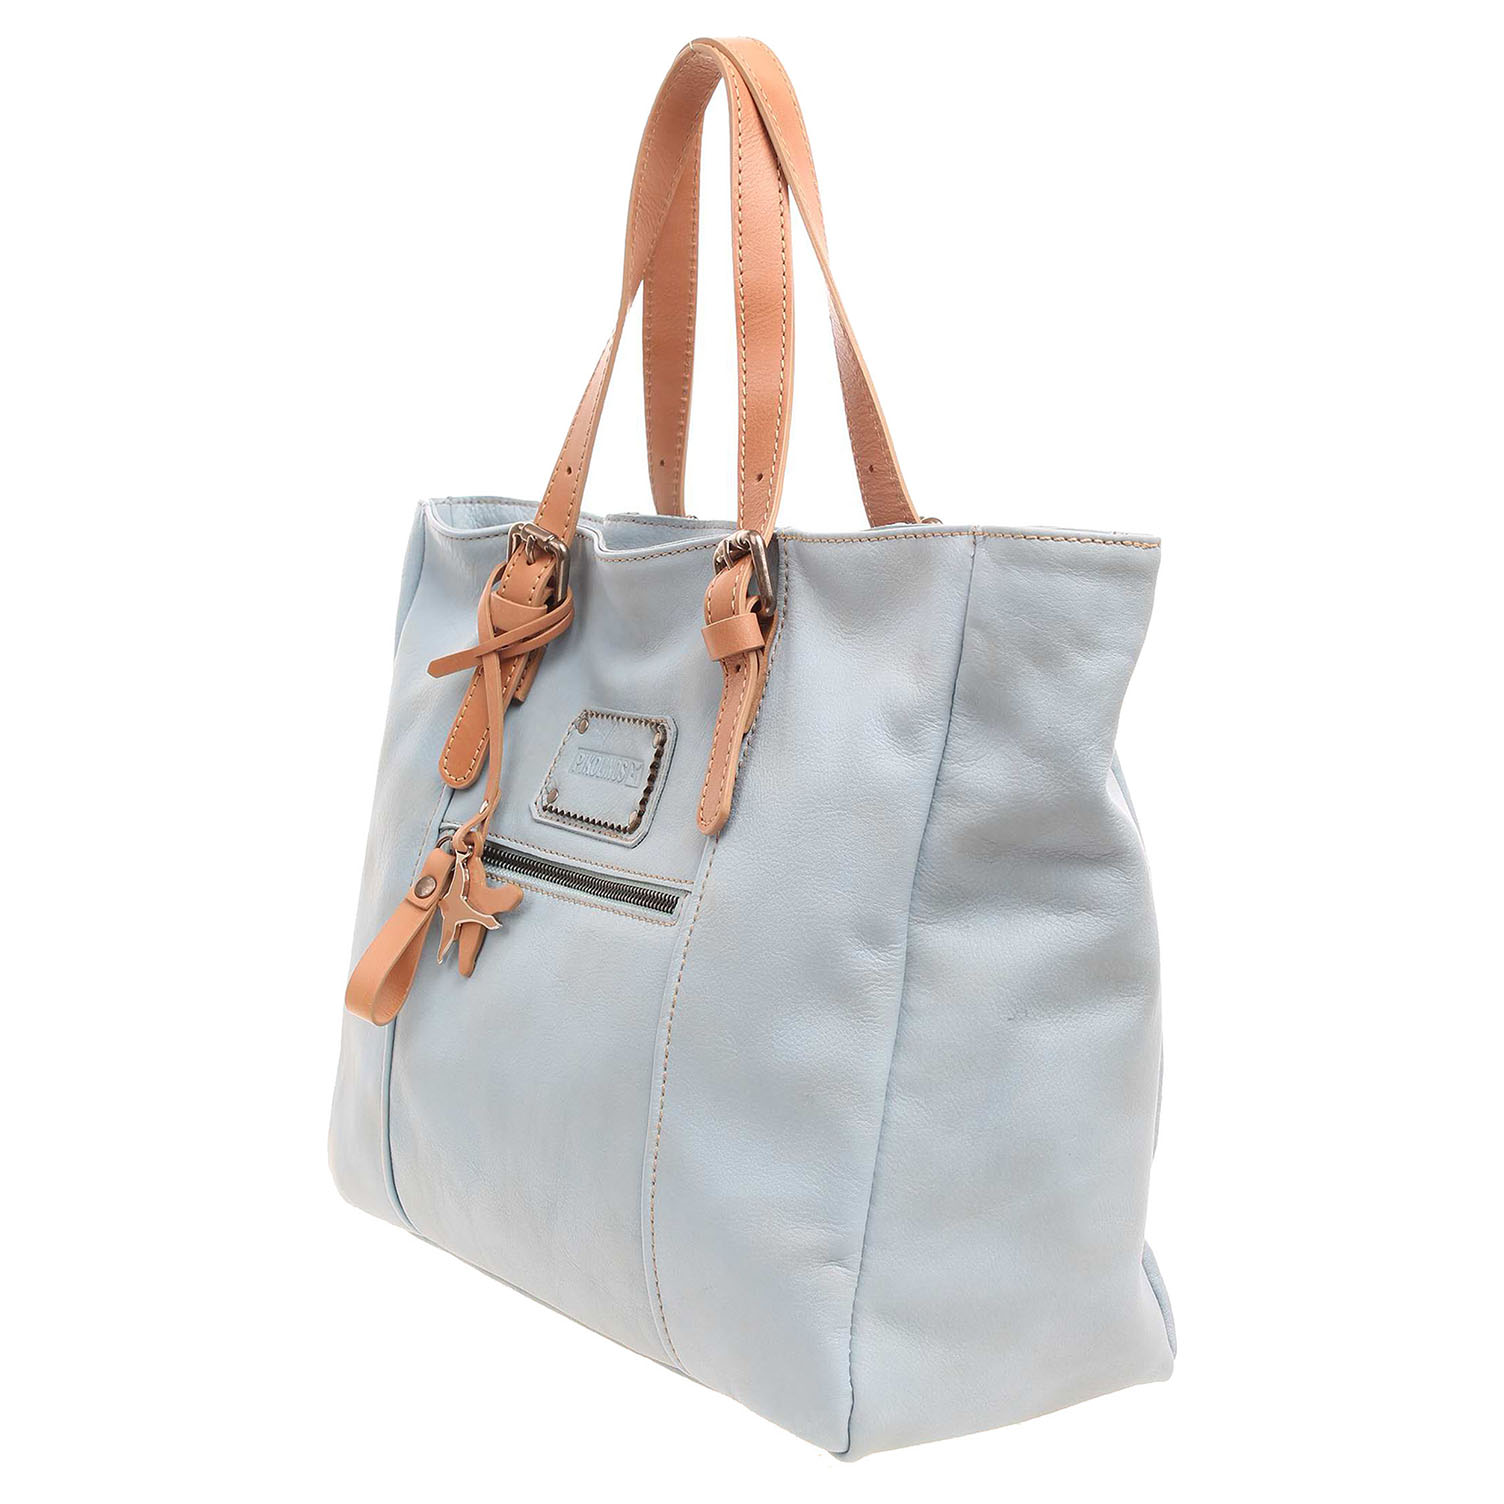 Ecco Pikolinos kabelka WHA-300KR modrá 11890956